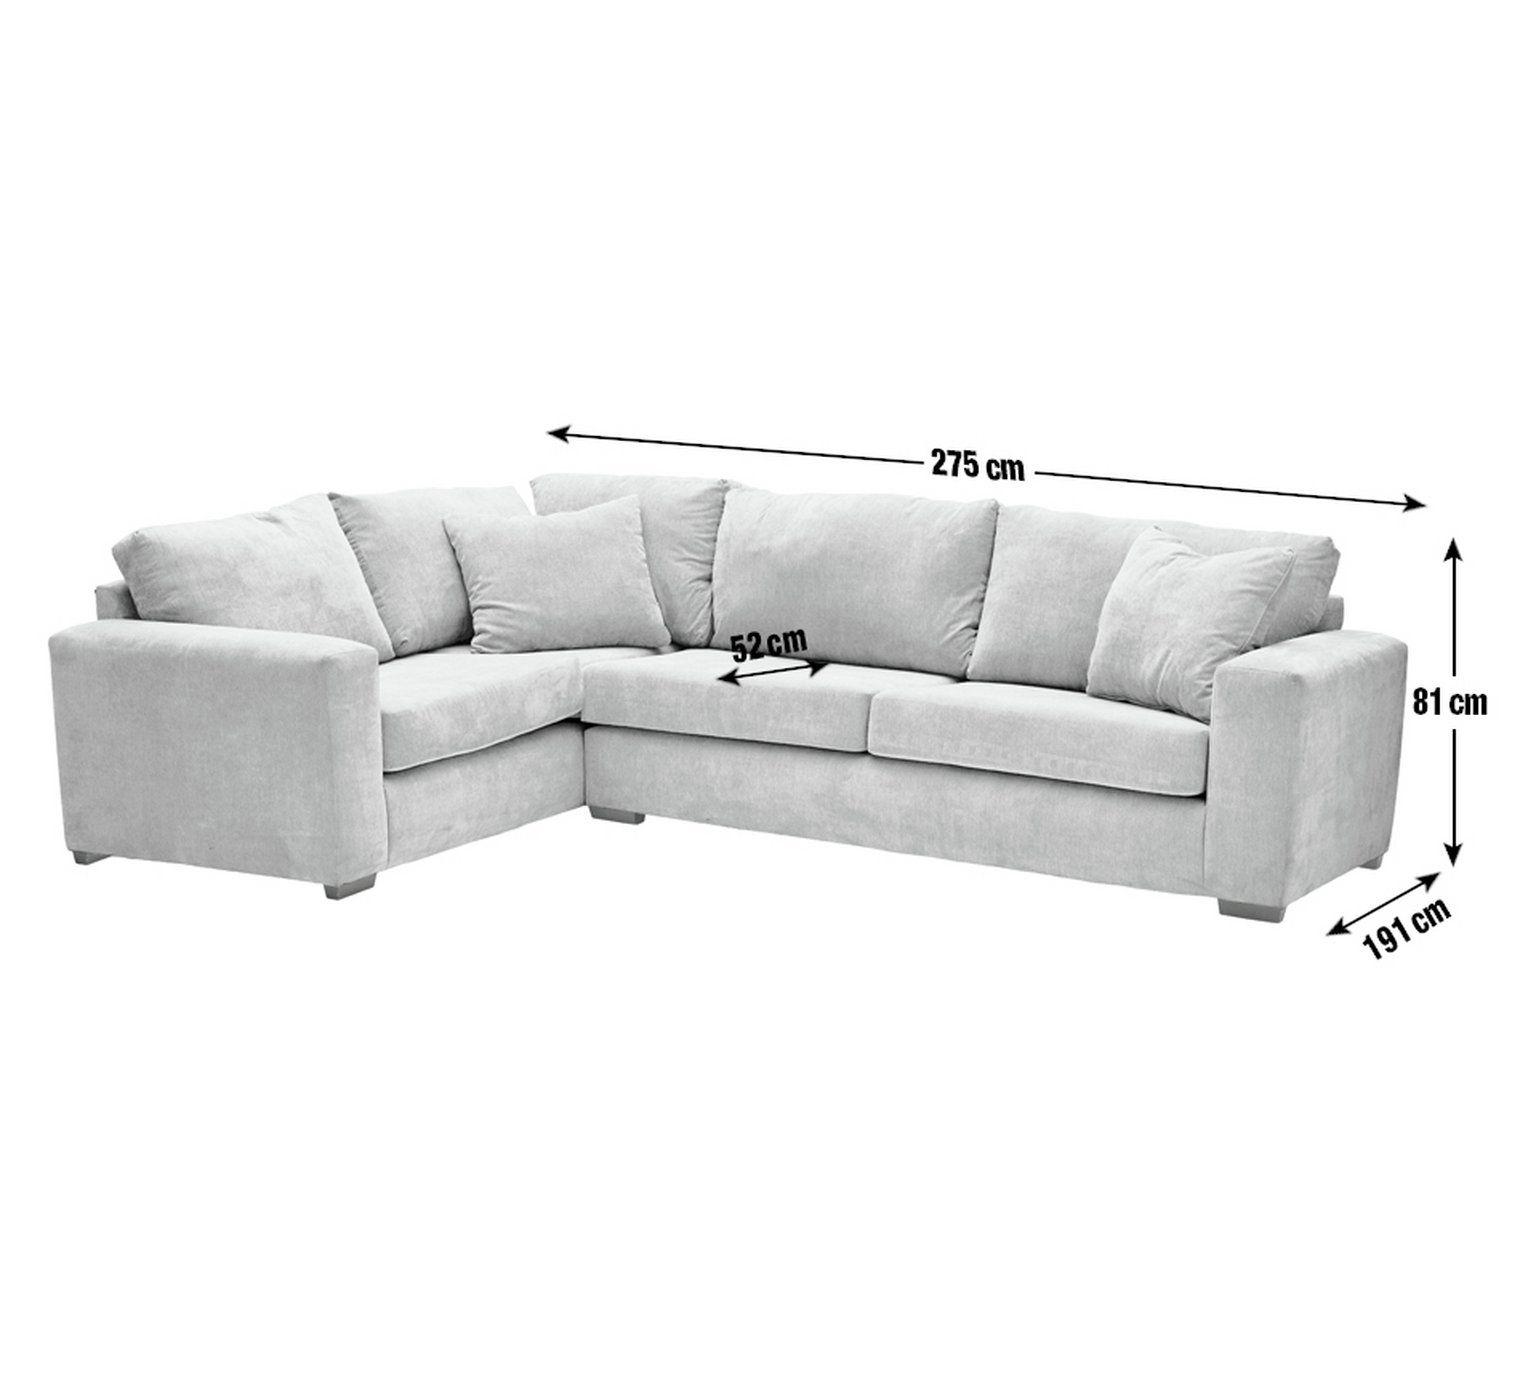 Buy Argos Home Eton Left Corner Fabric Sofa Black Sofas Black Fabric Sofa Black Sofa Fabric Sofa